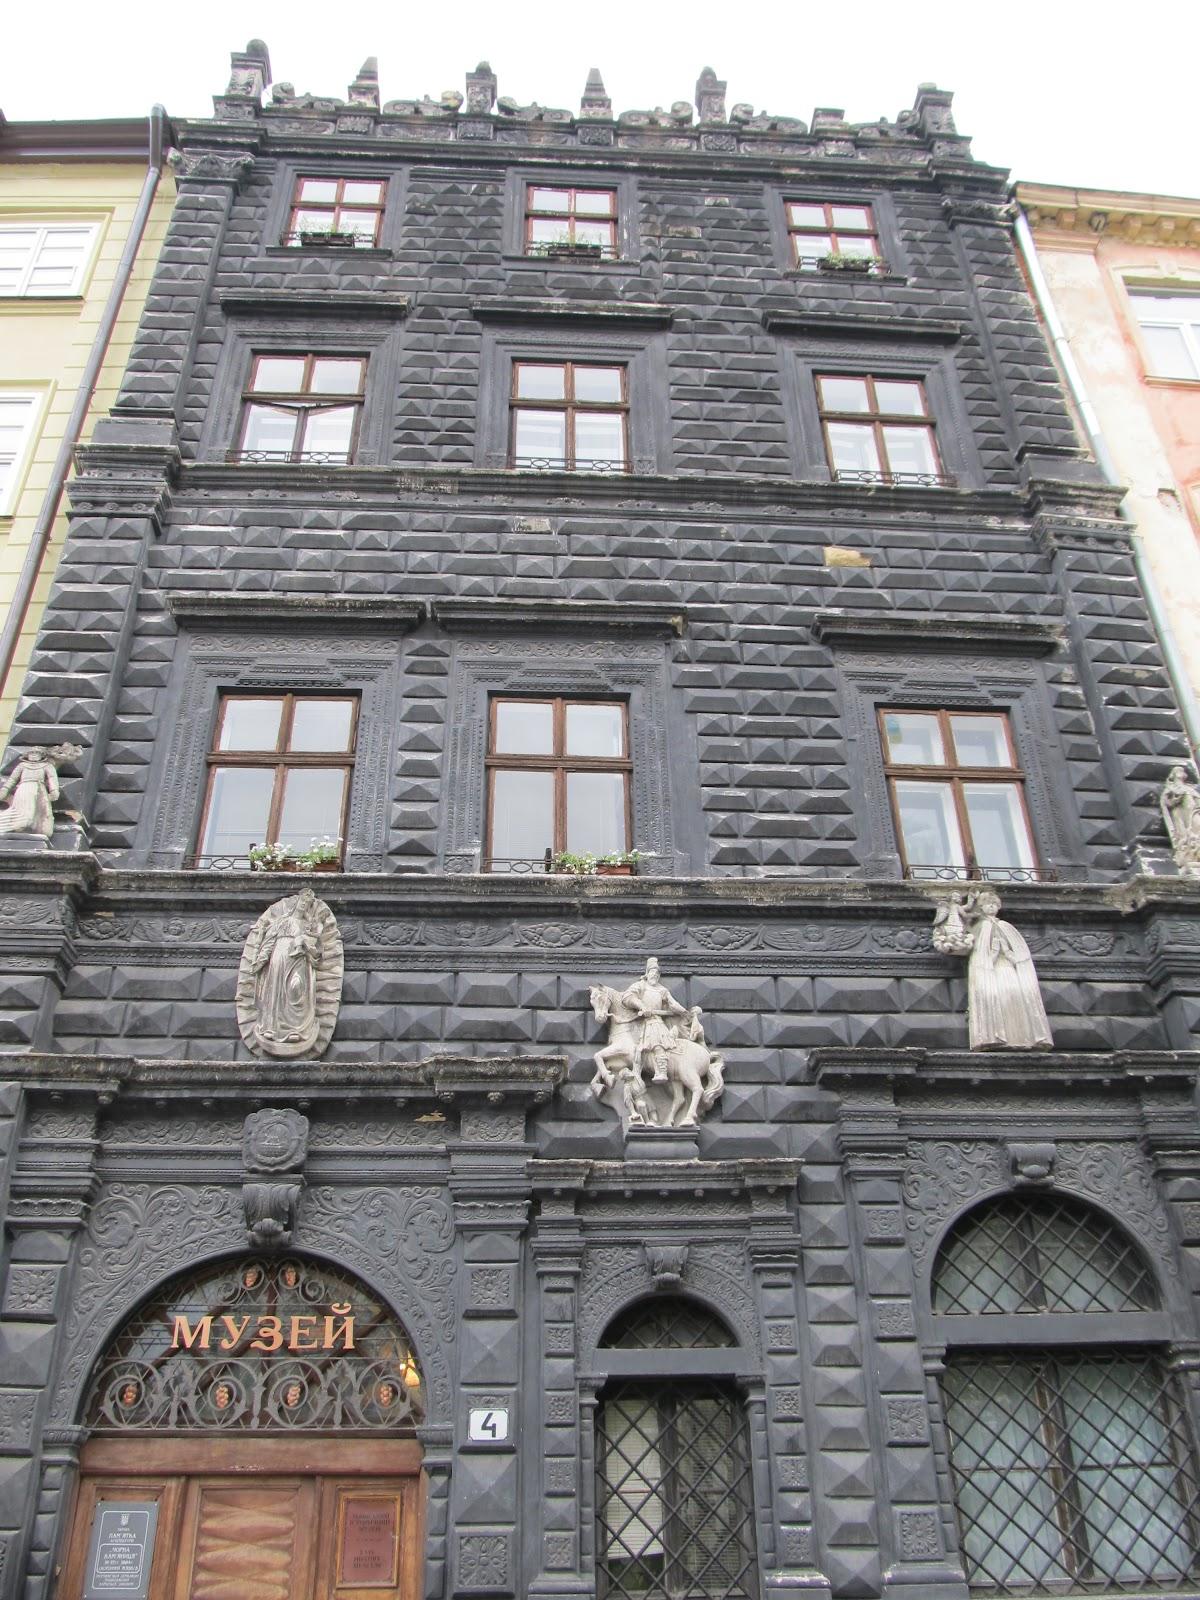 Czarna Kamienica - ренесанська архітектура